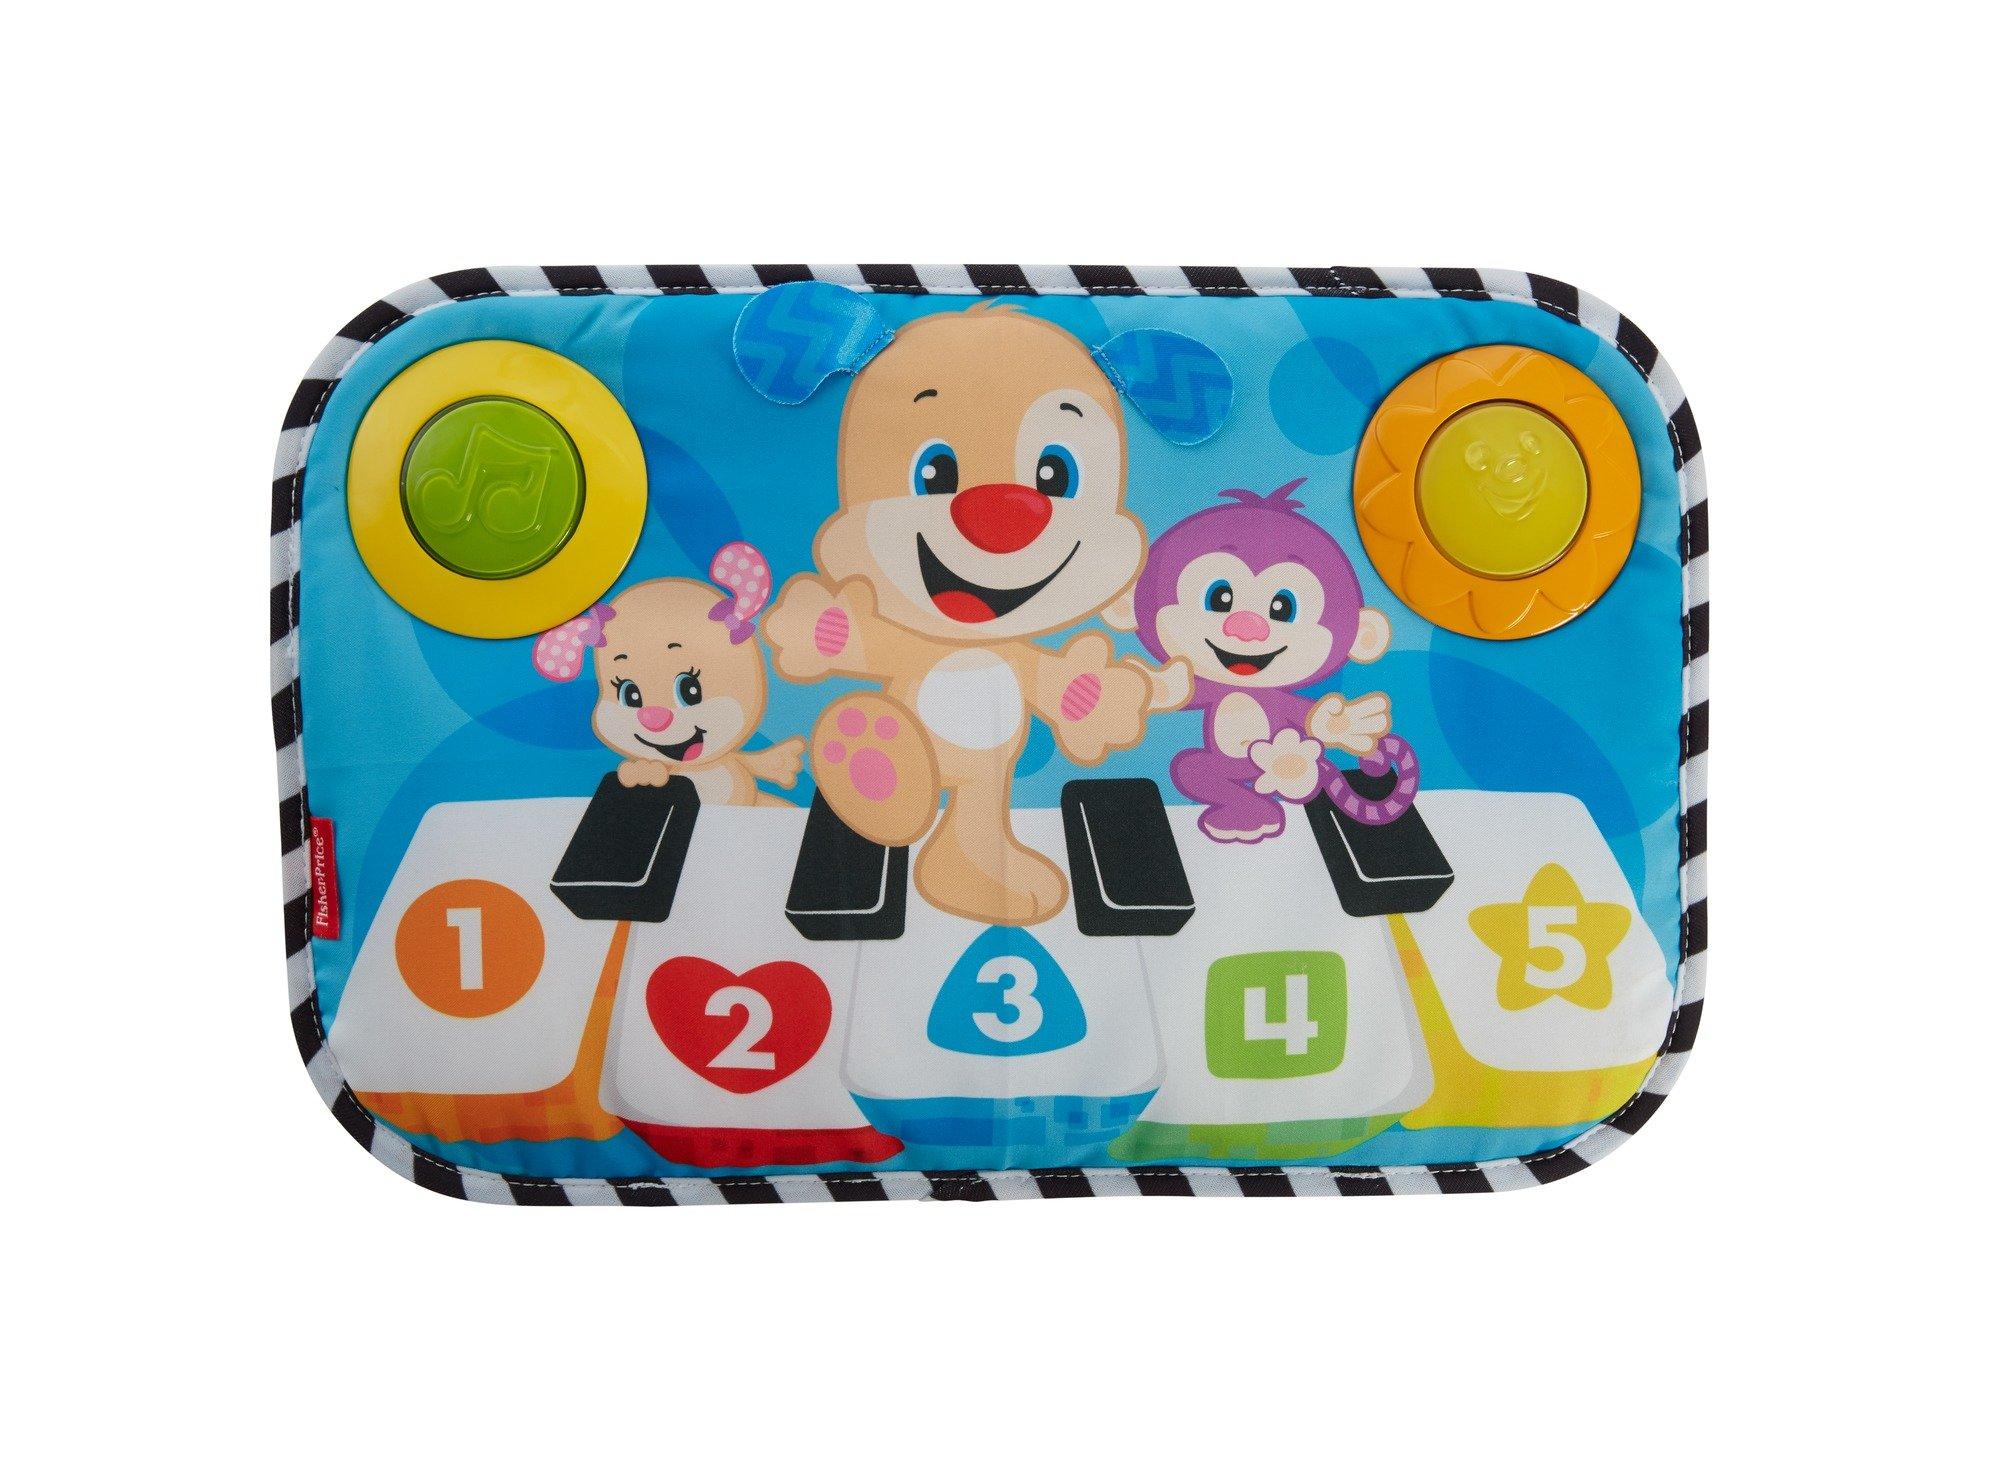 Fisher-Price Piano perrito pataditas, juguete musical para bebé (Mattel FHJ40) product